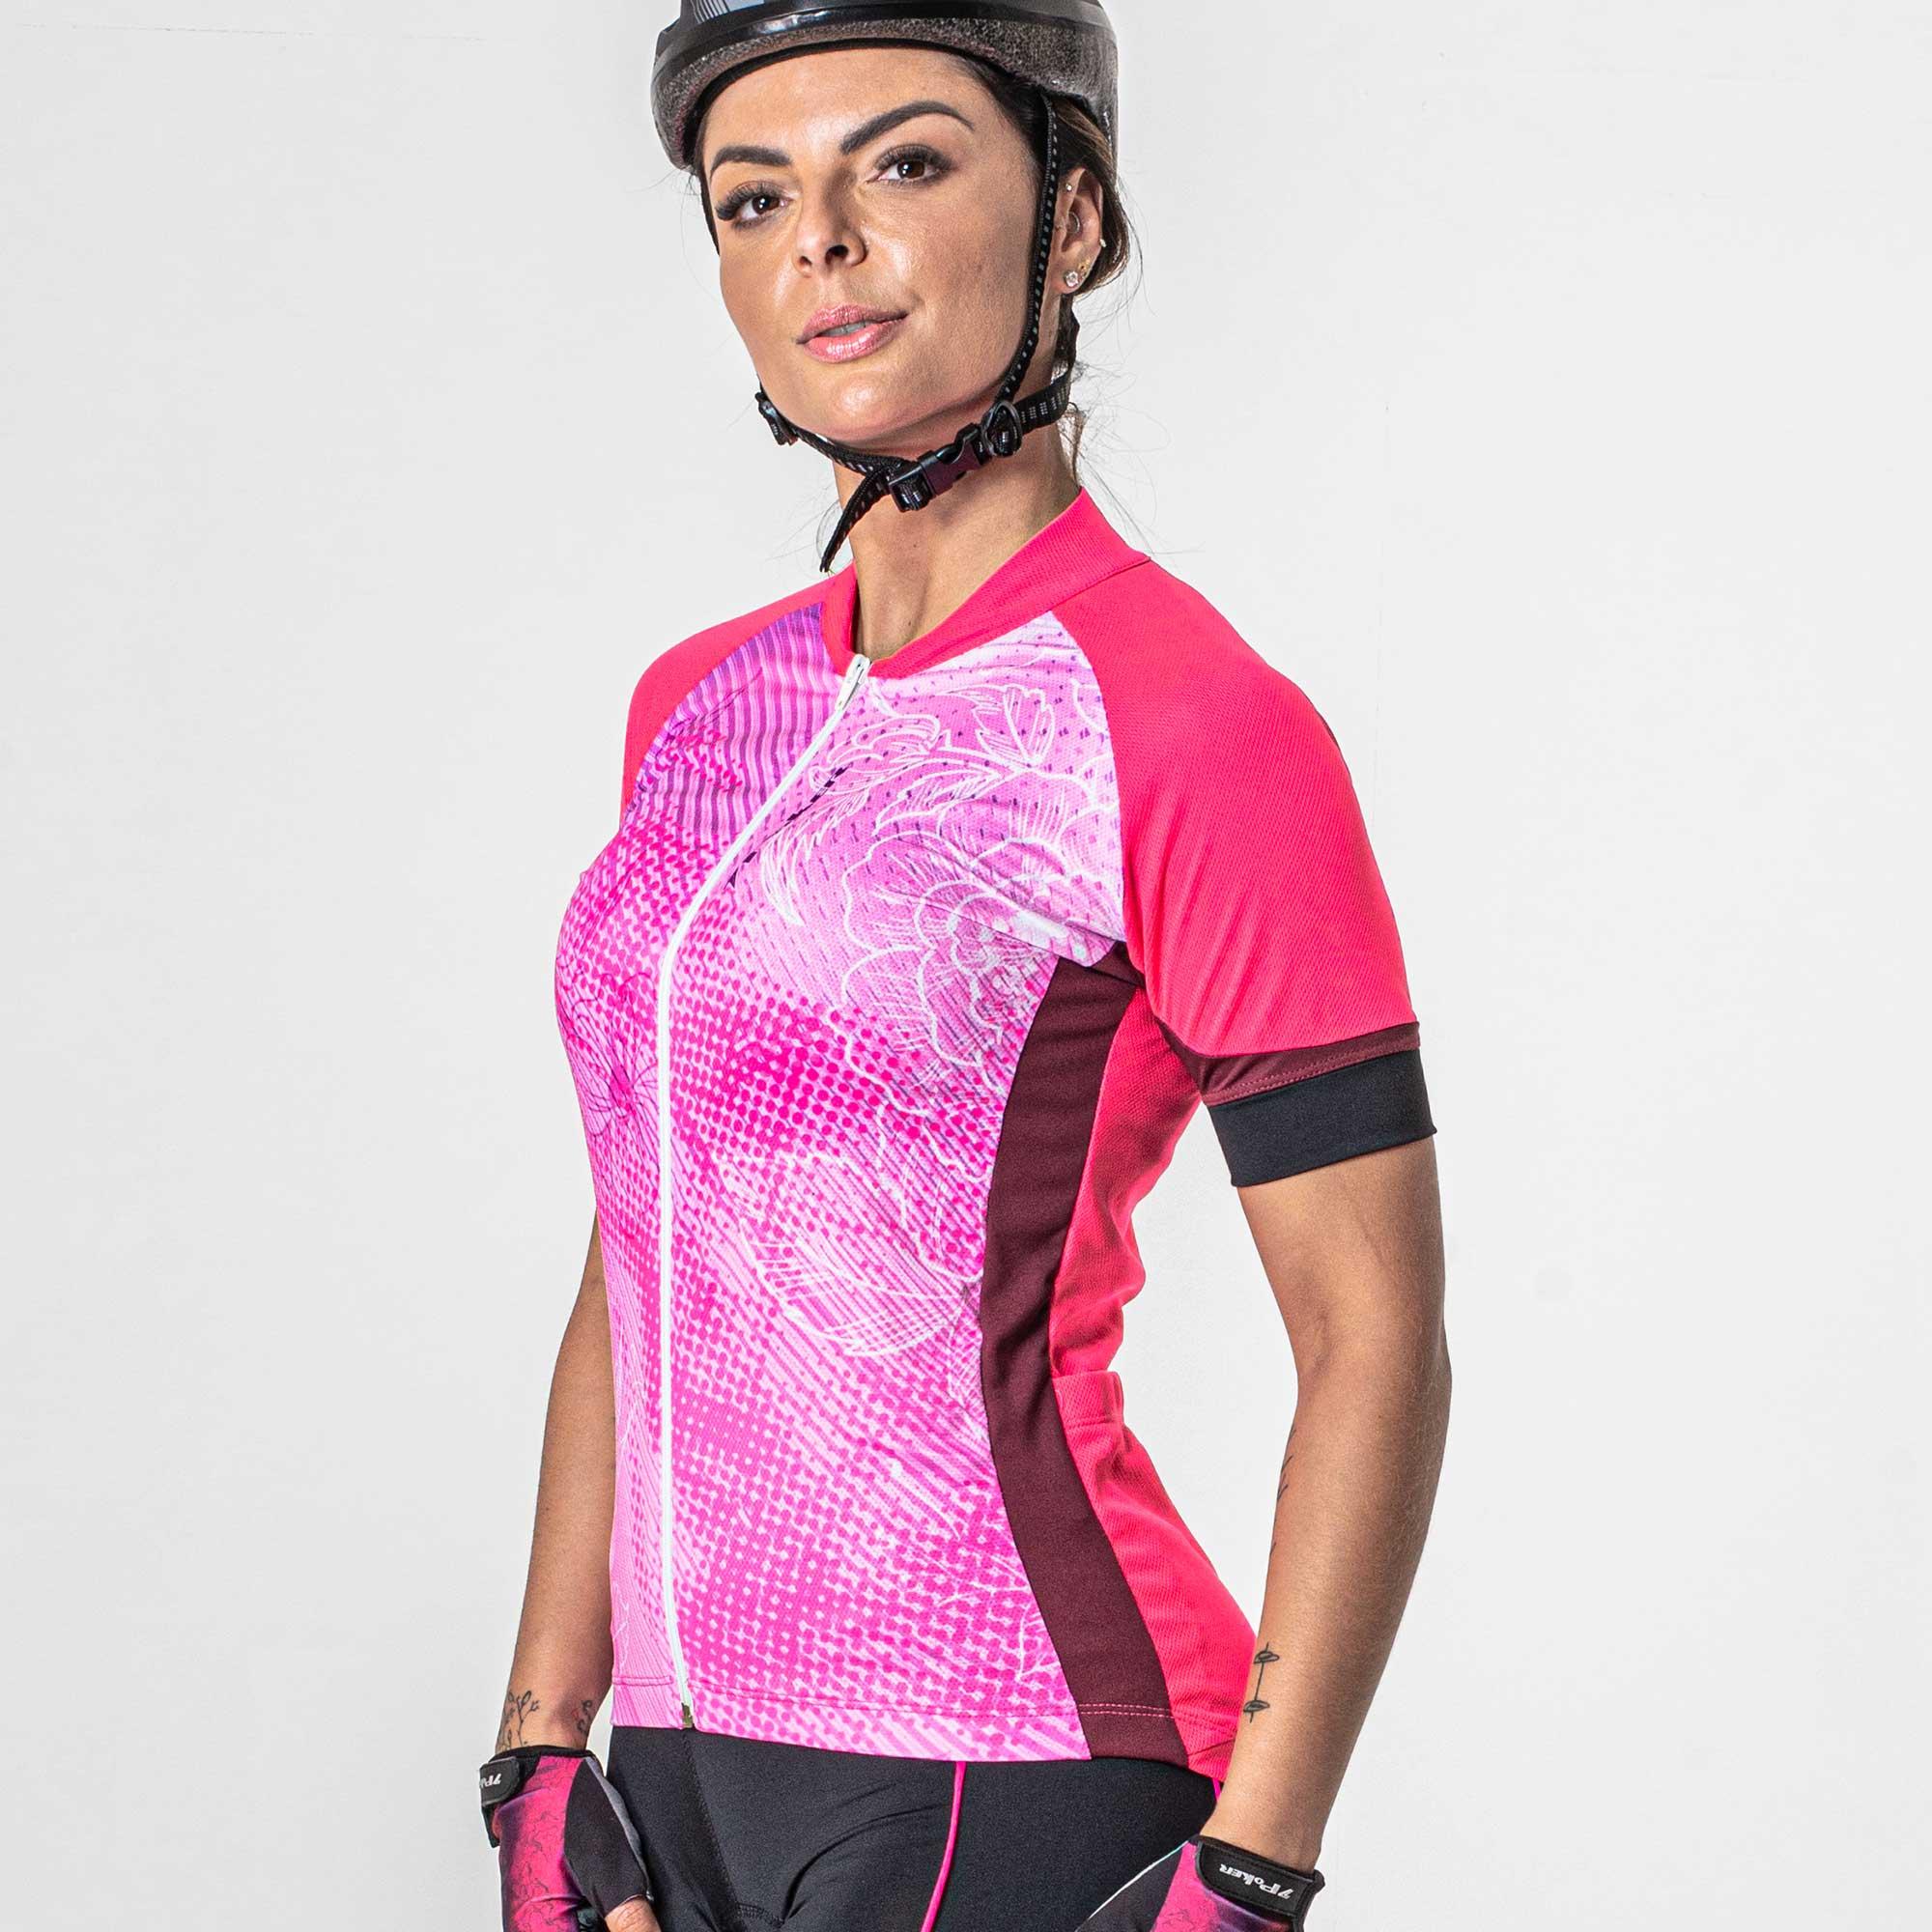 Camisa Ciclista Manga Curta Zíper Total Feminina Jewel 04238